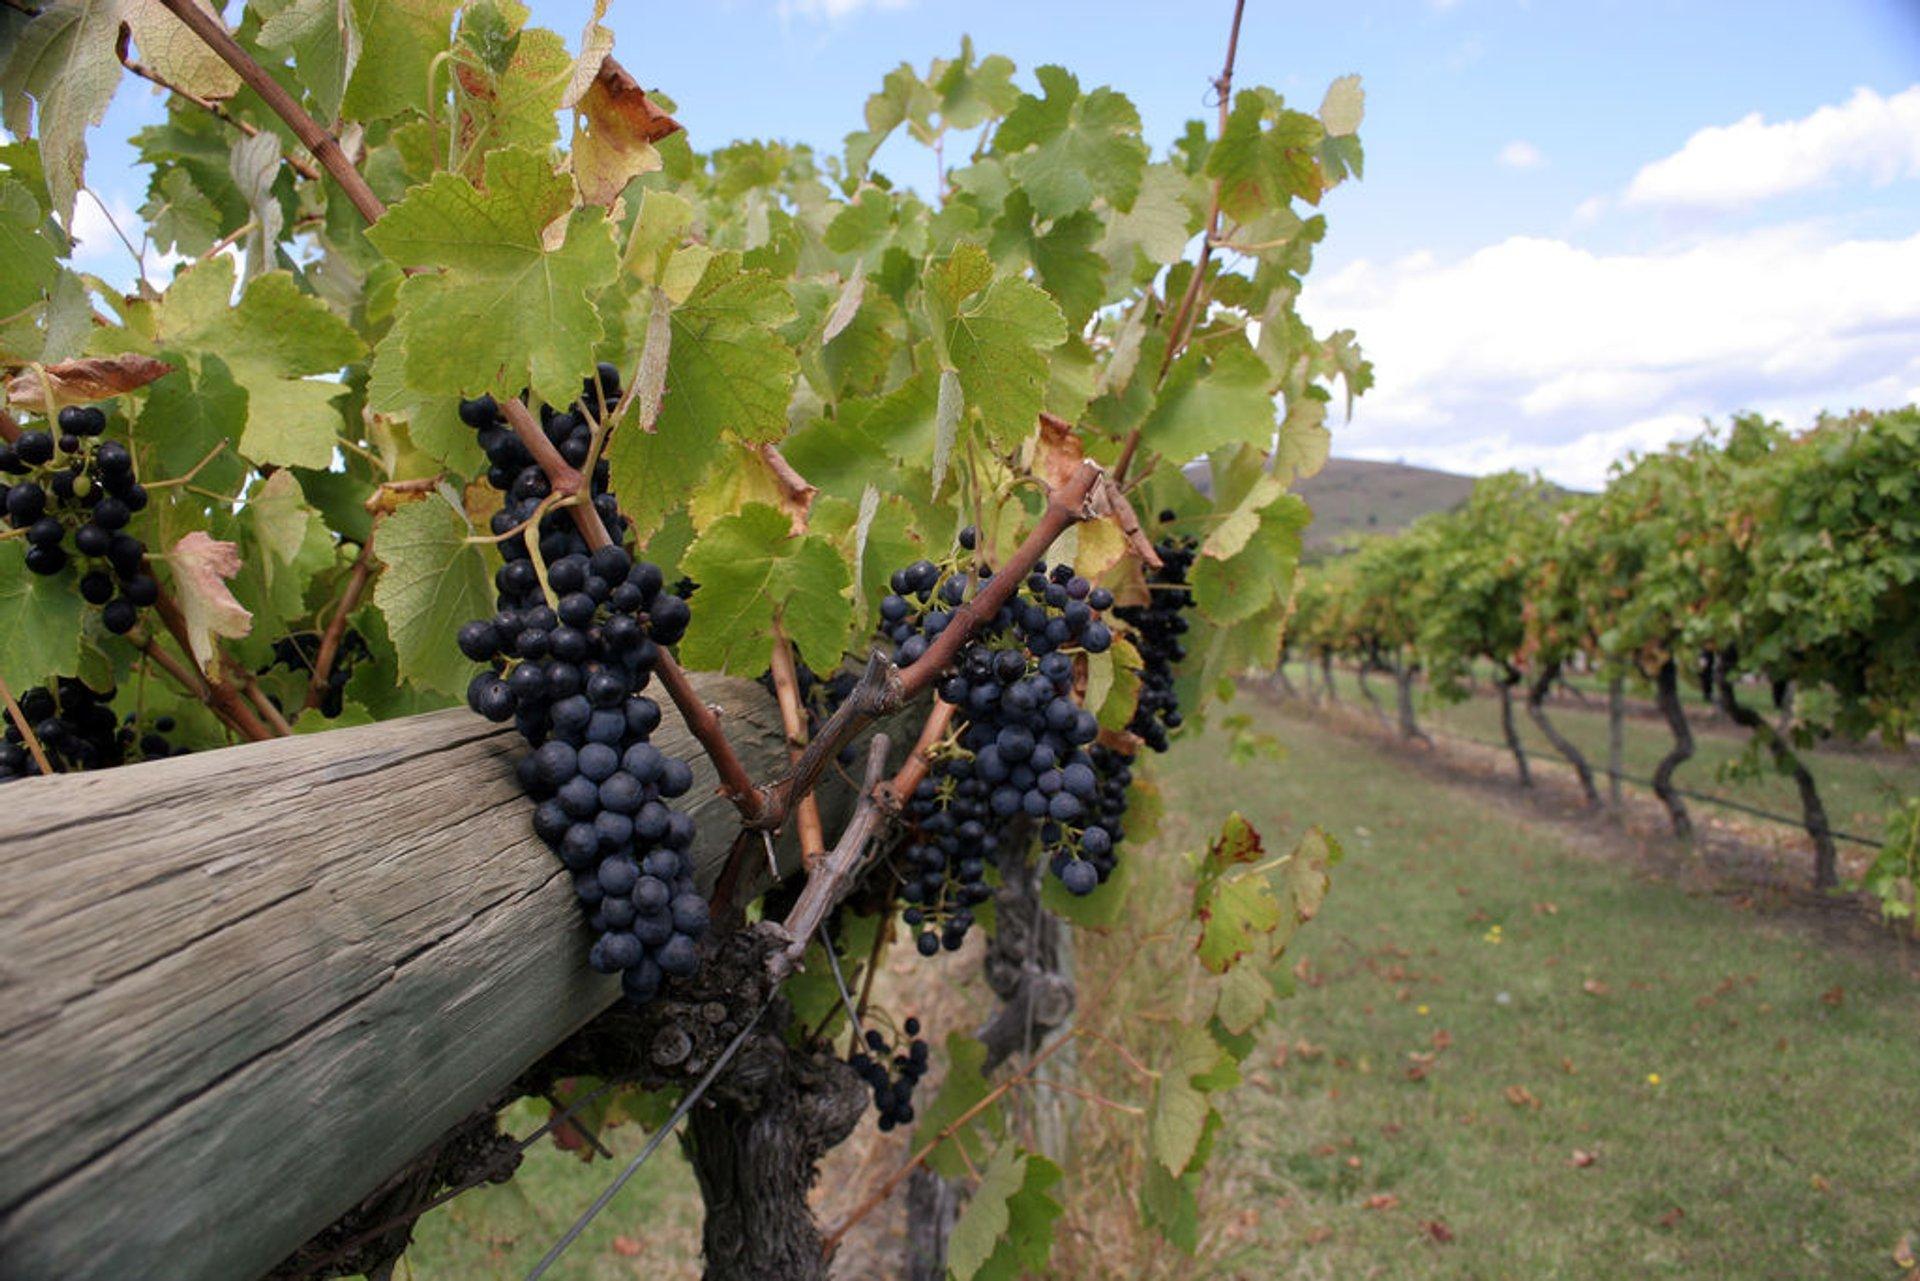 Grape Harvest in Yarra Valley in Melbourne 2020 - Best Time